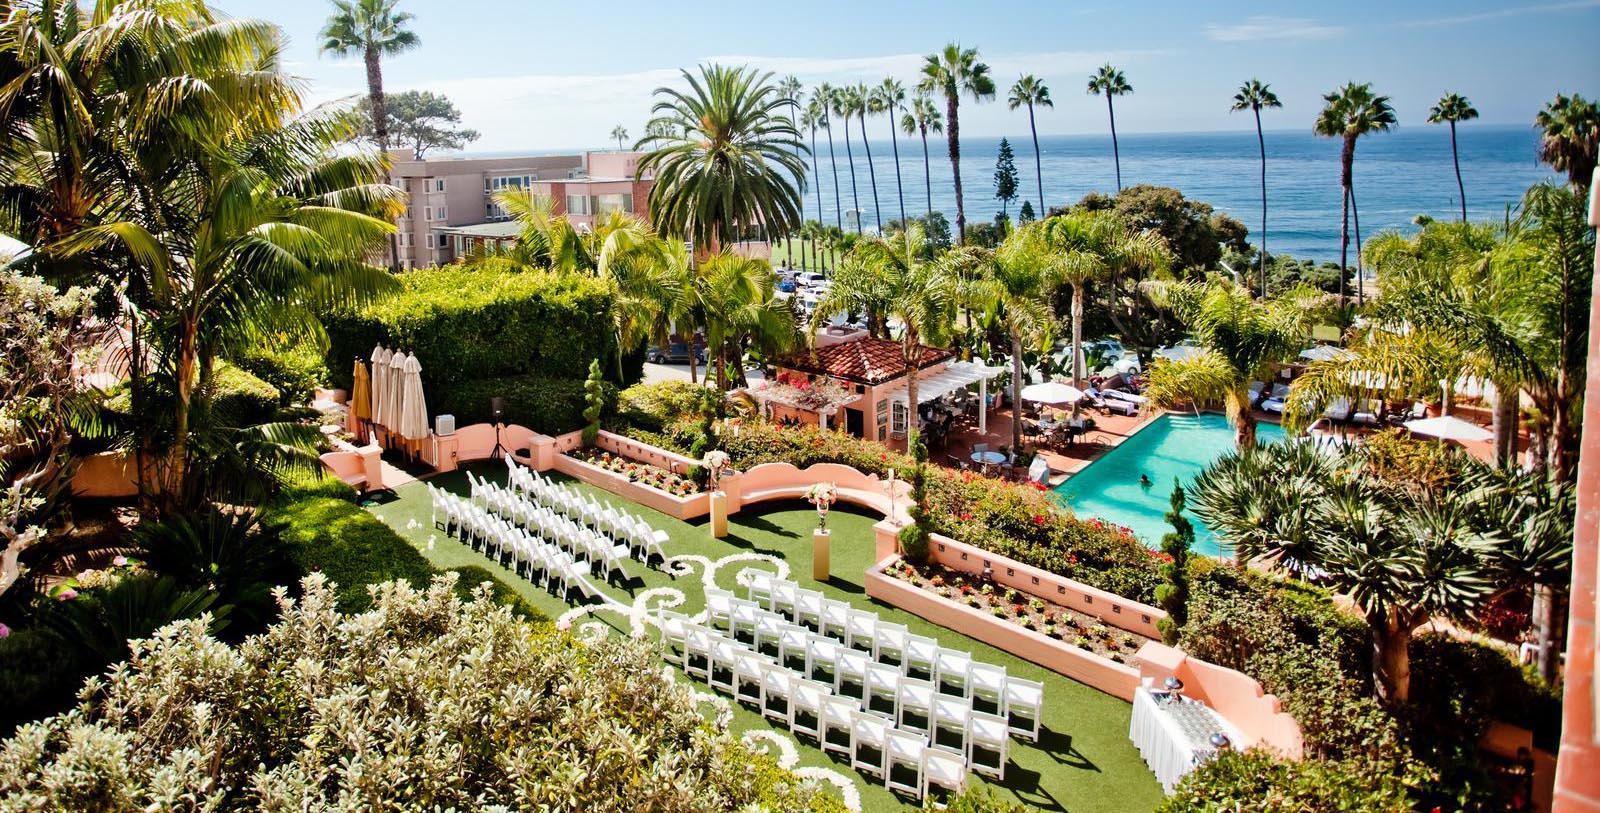 Image of Event in EL Jardin, La Valencia Hotel in La Jolla, Califronia, 1926, Member of Historic Hotels of America, Experience